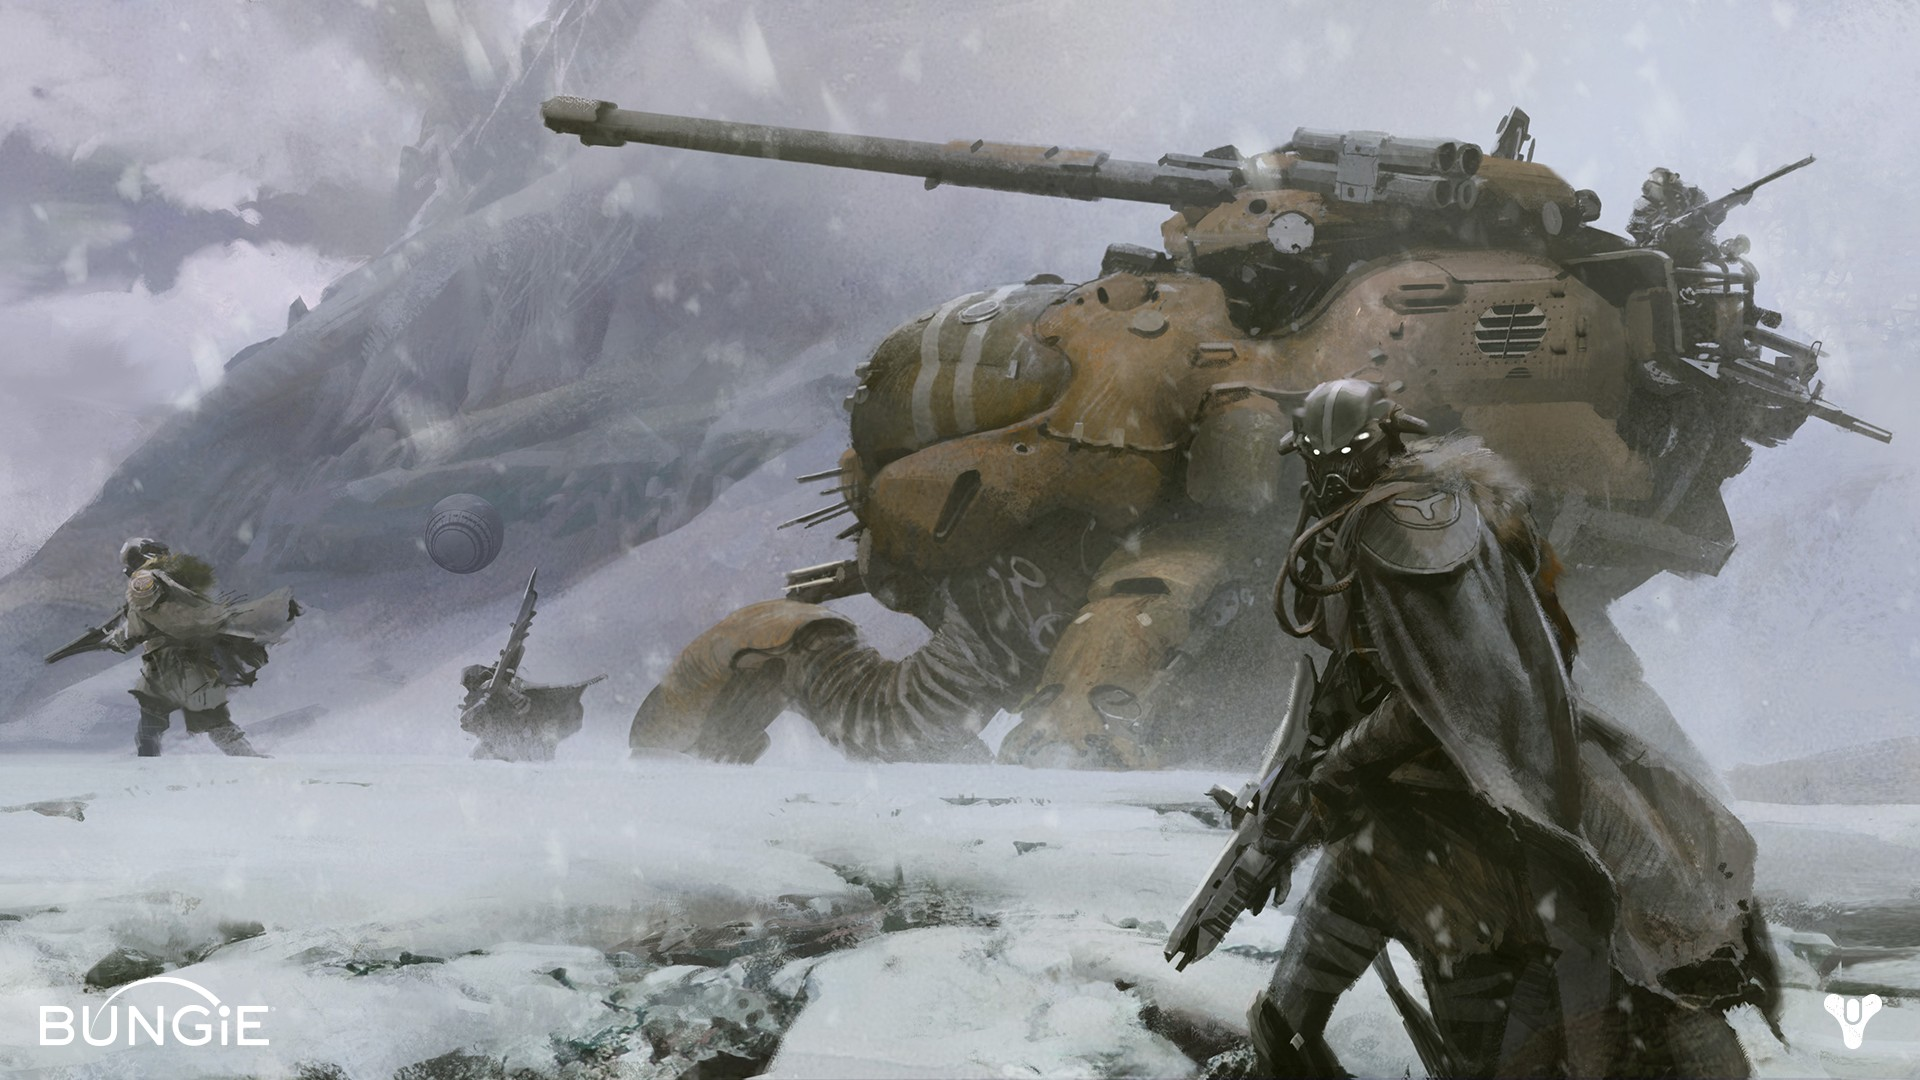 Bungie-Destiny-Leak_11-27